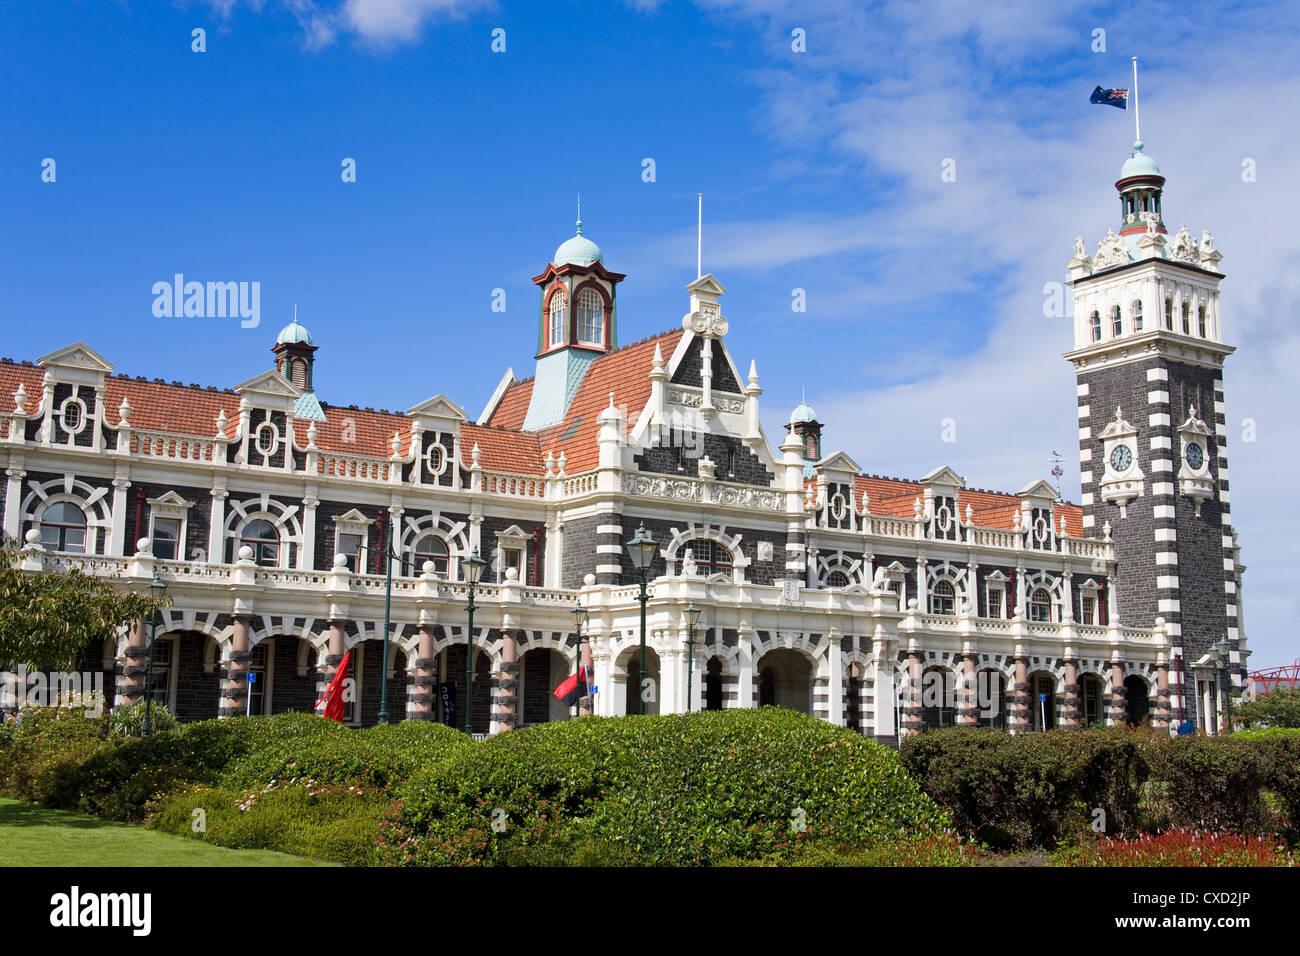 Bahnhof, Central Business District, Dunedin, Otago District, South Island, Neuseeland, Pazifik Stockbild